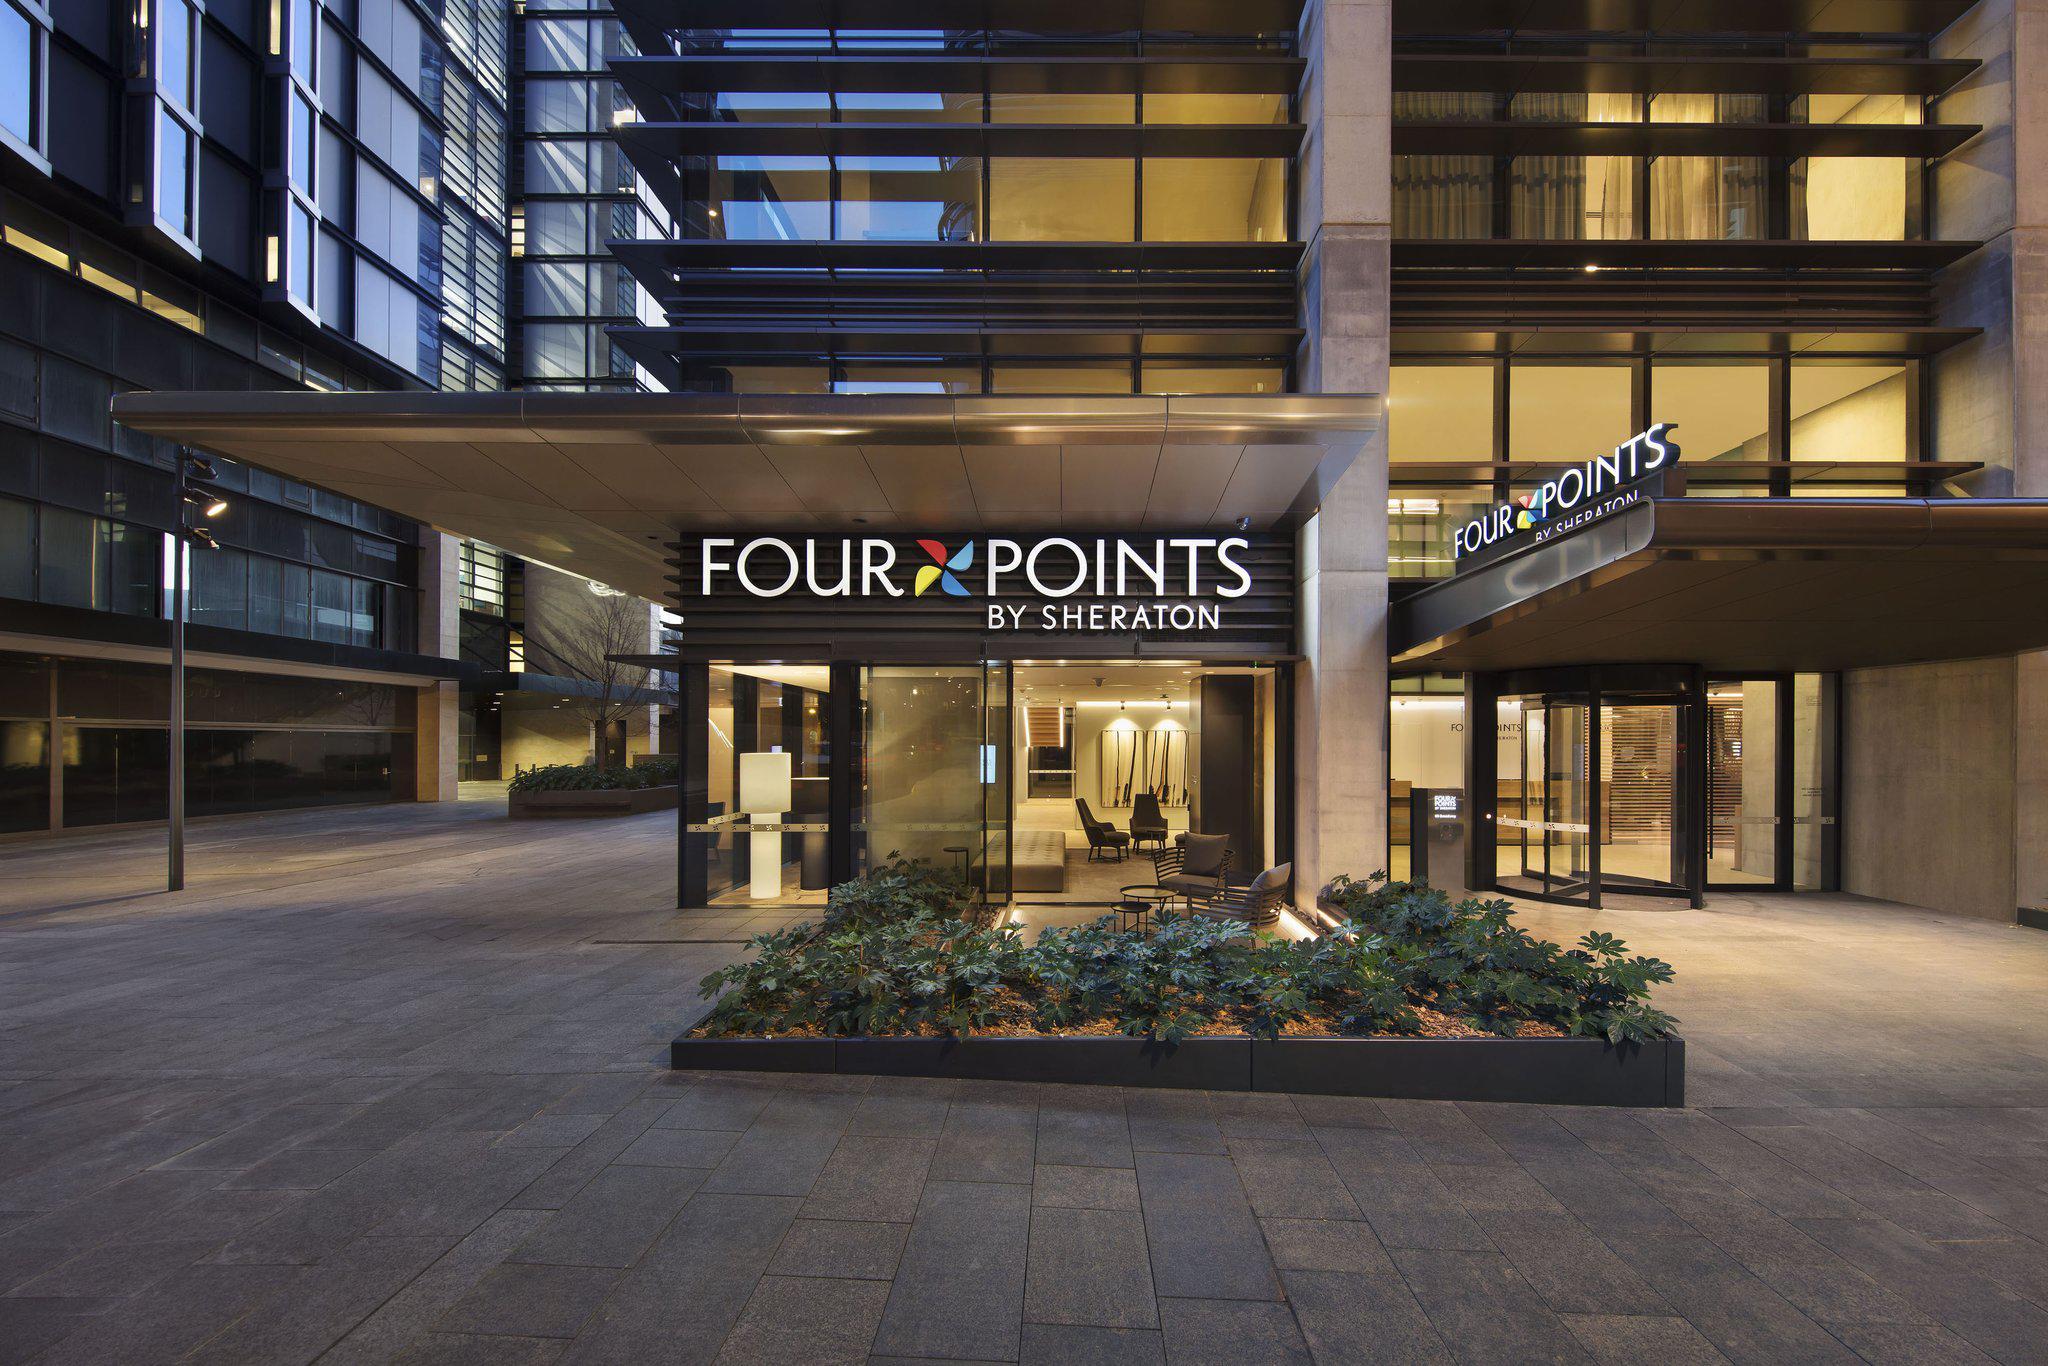 Four Points by Sheraton Sydney, Central Park